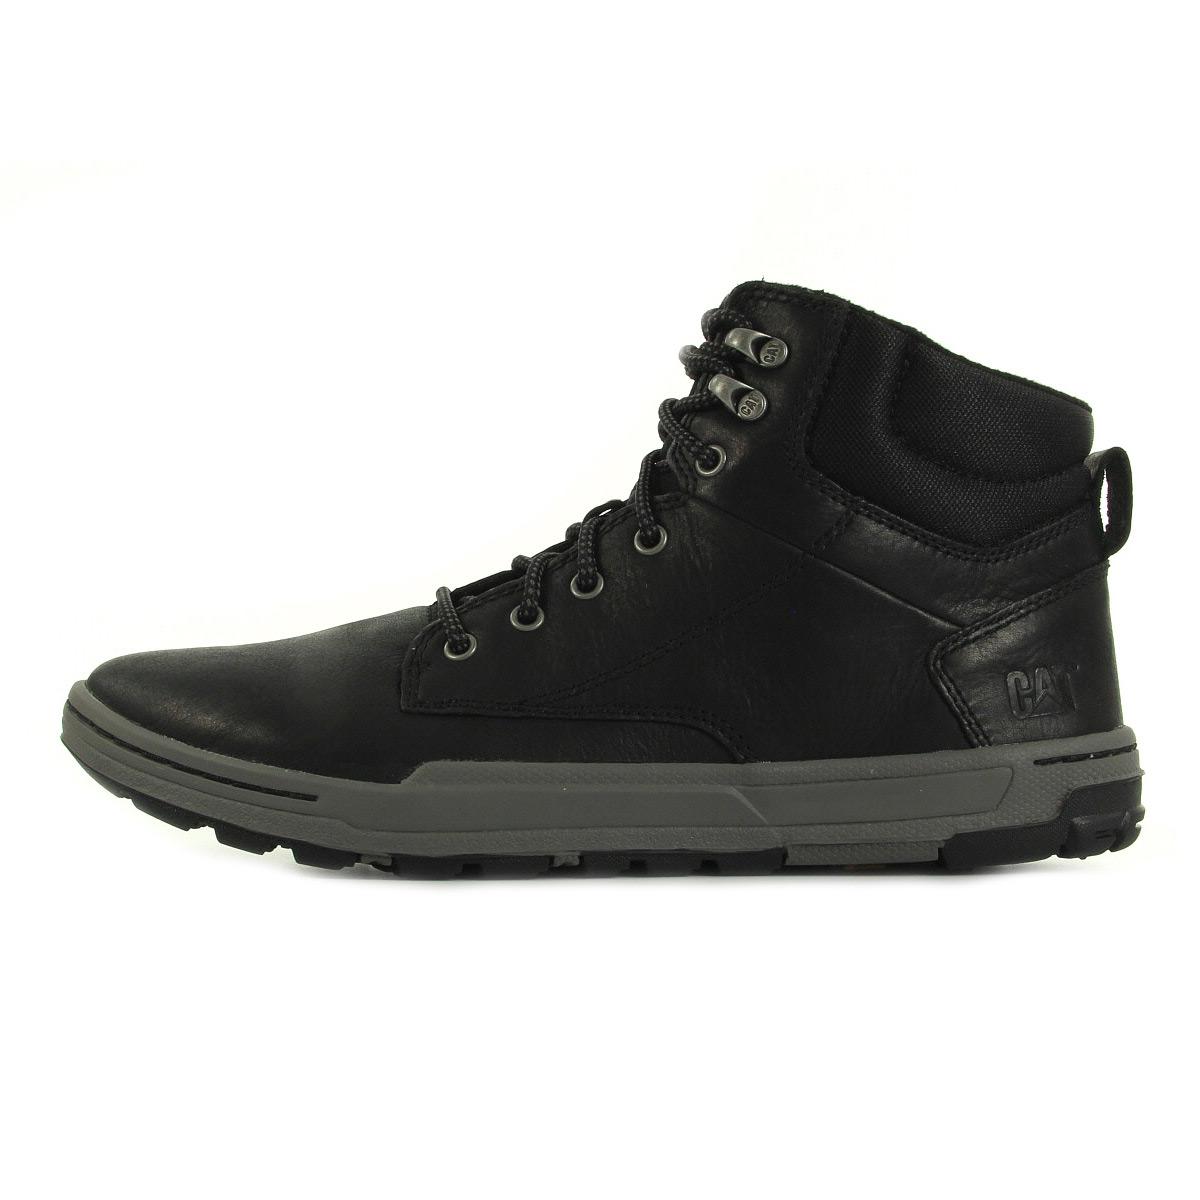 7ae7c3b6cac7 Colfax Boots Caterpillar Homme Black P720279 Mid ZqwvPd